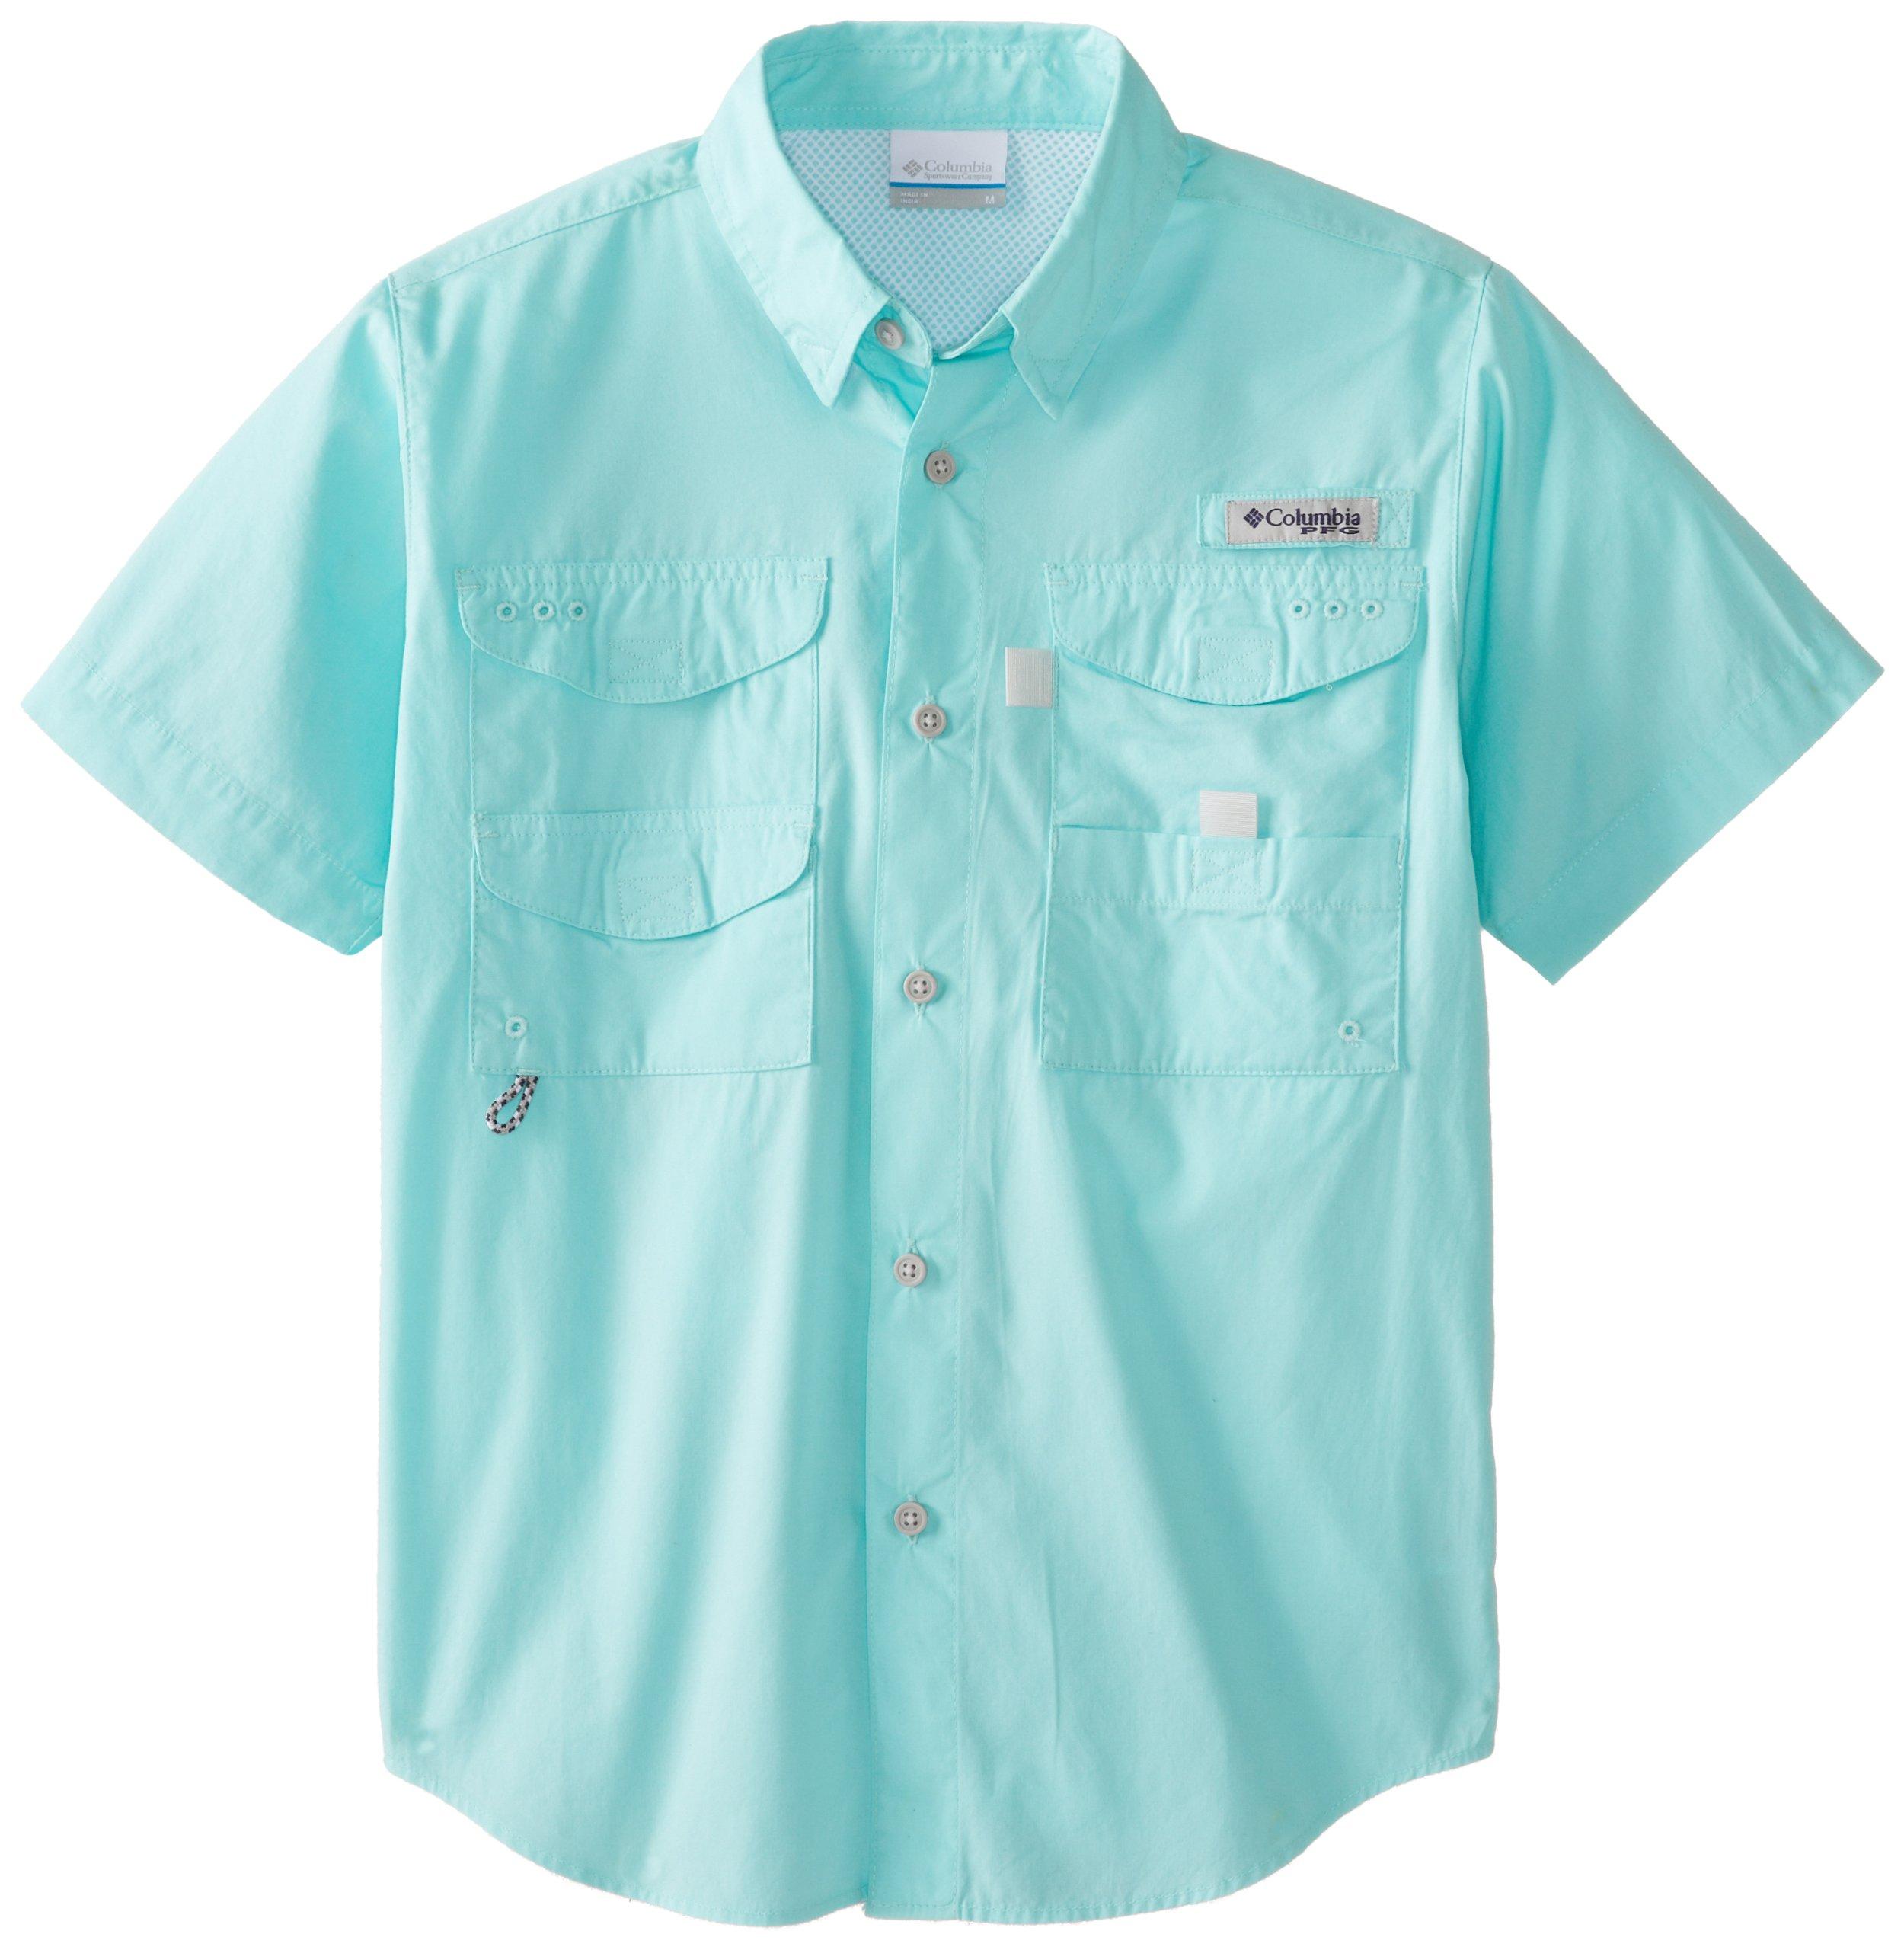 Columbia Boy's Bonehead Short Sleeve Shirt (Youth), Gulf Stream, XX-Small